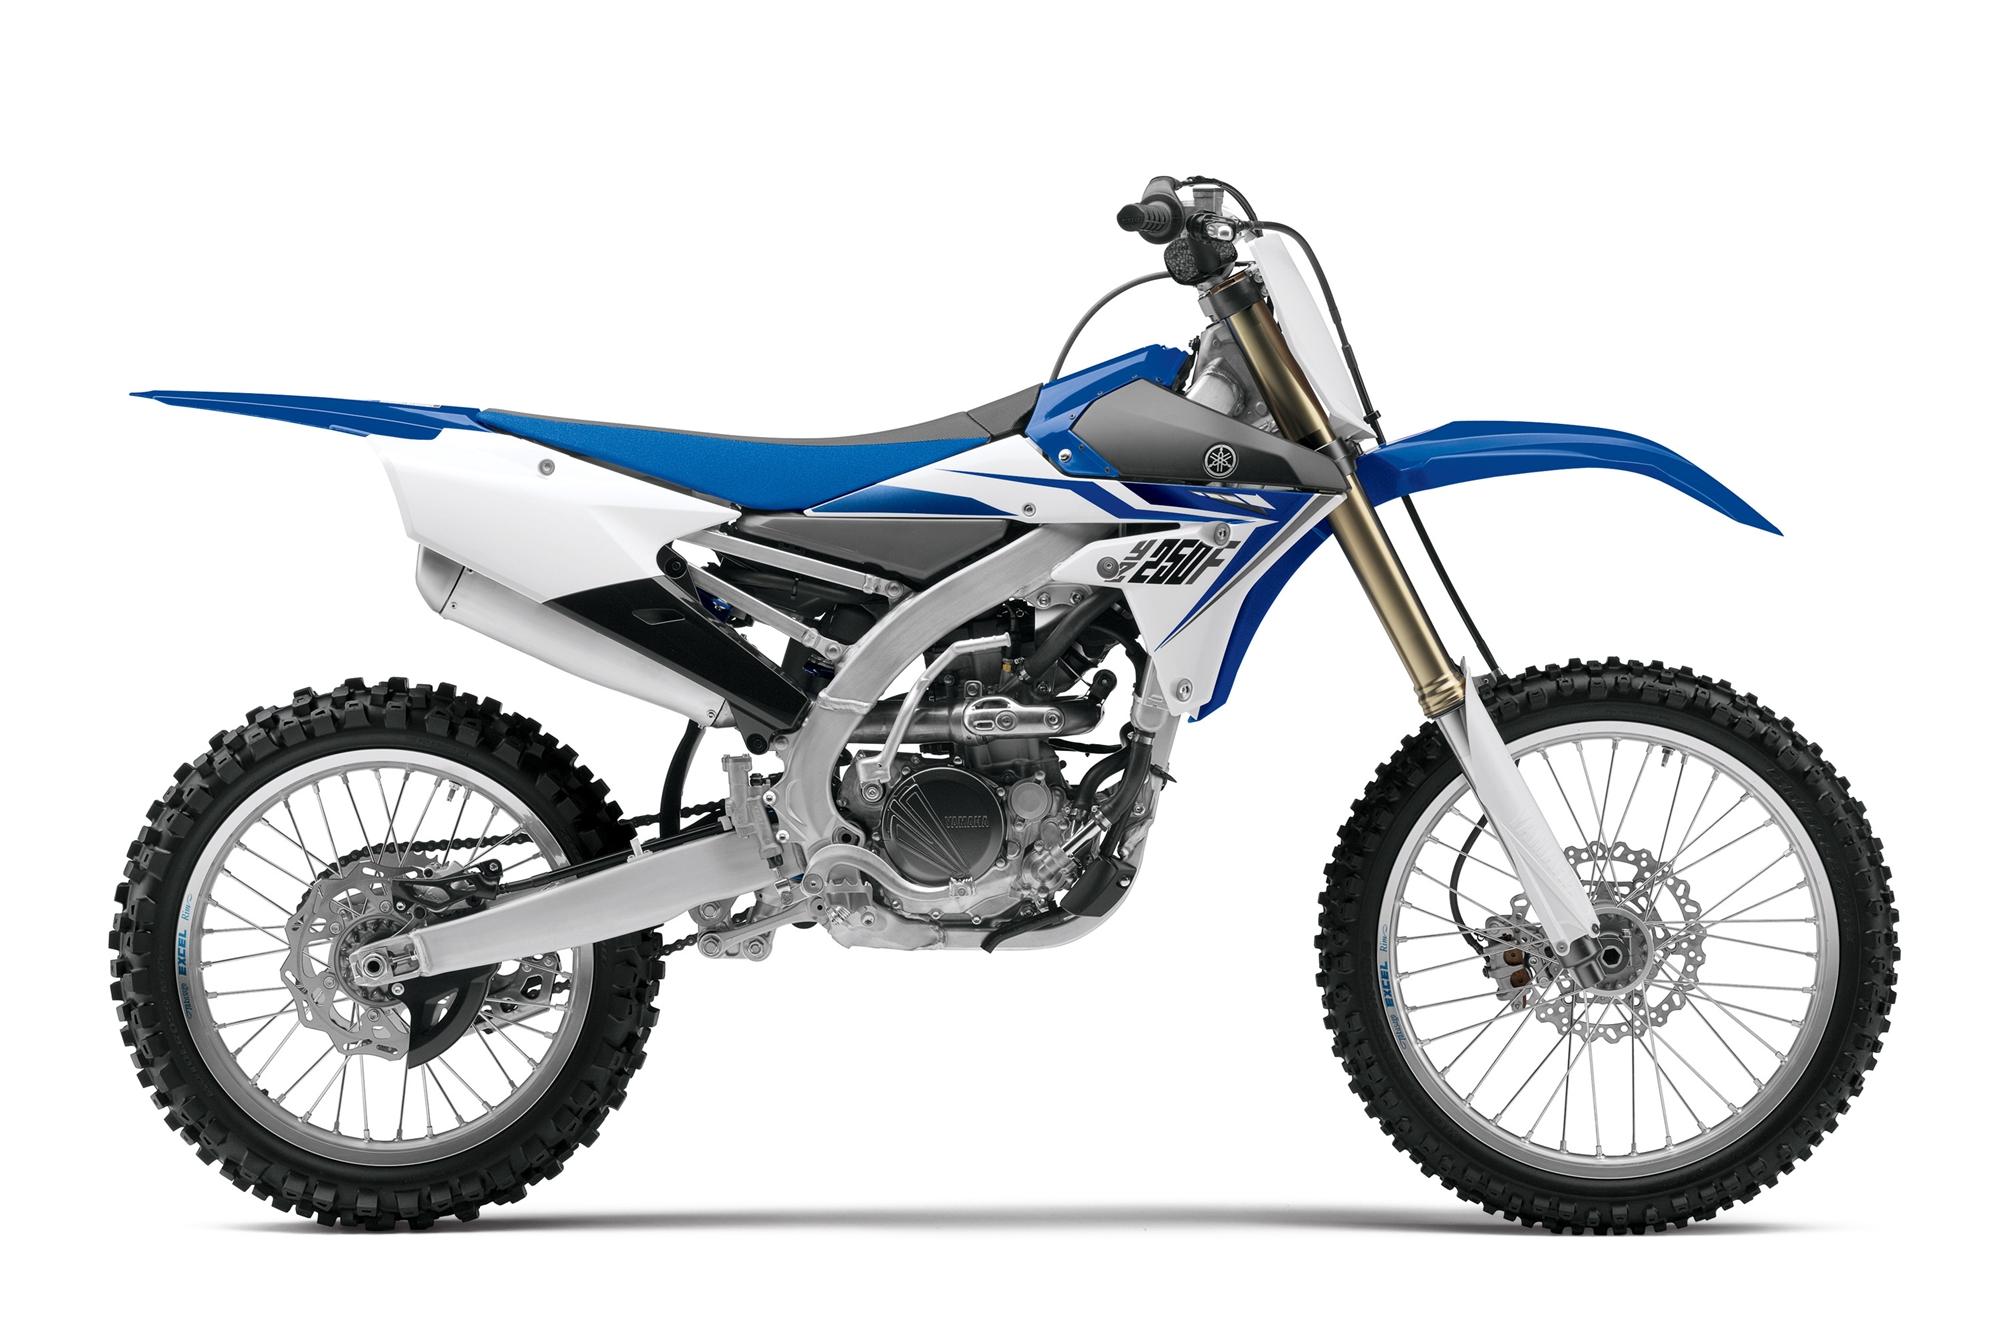 2014 Yamaha YZ 250 F | Pinetown | Gumtree Classifieds